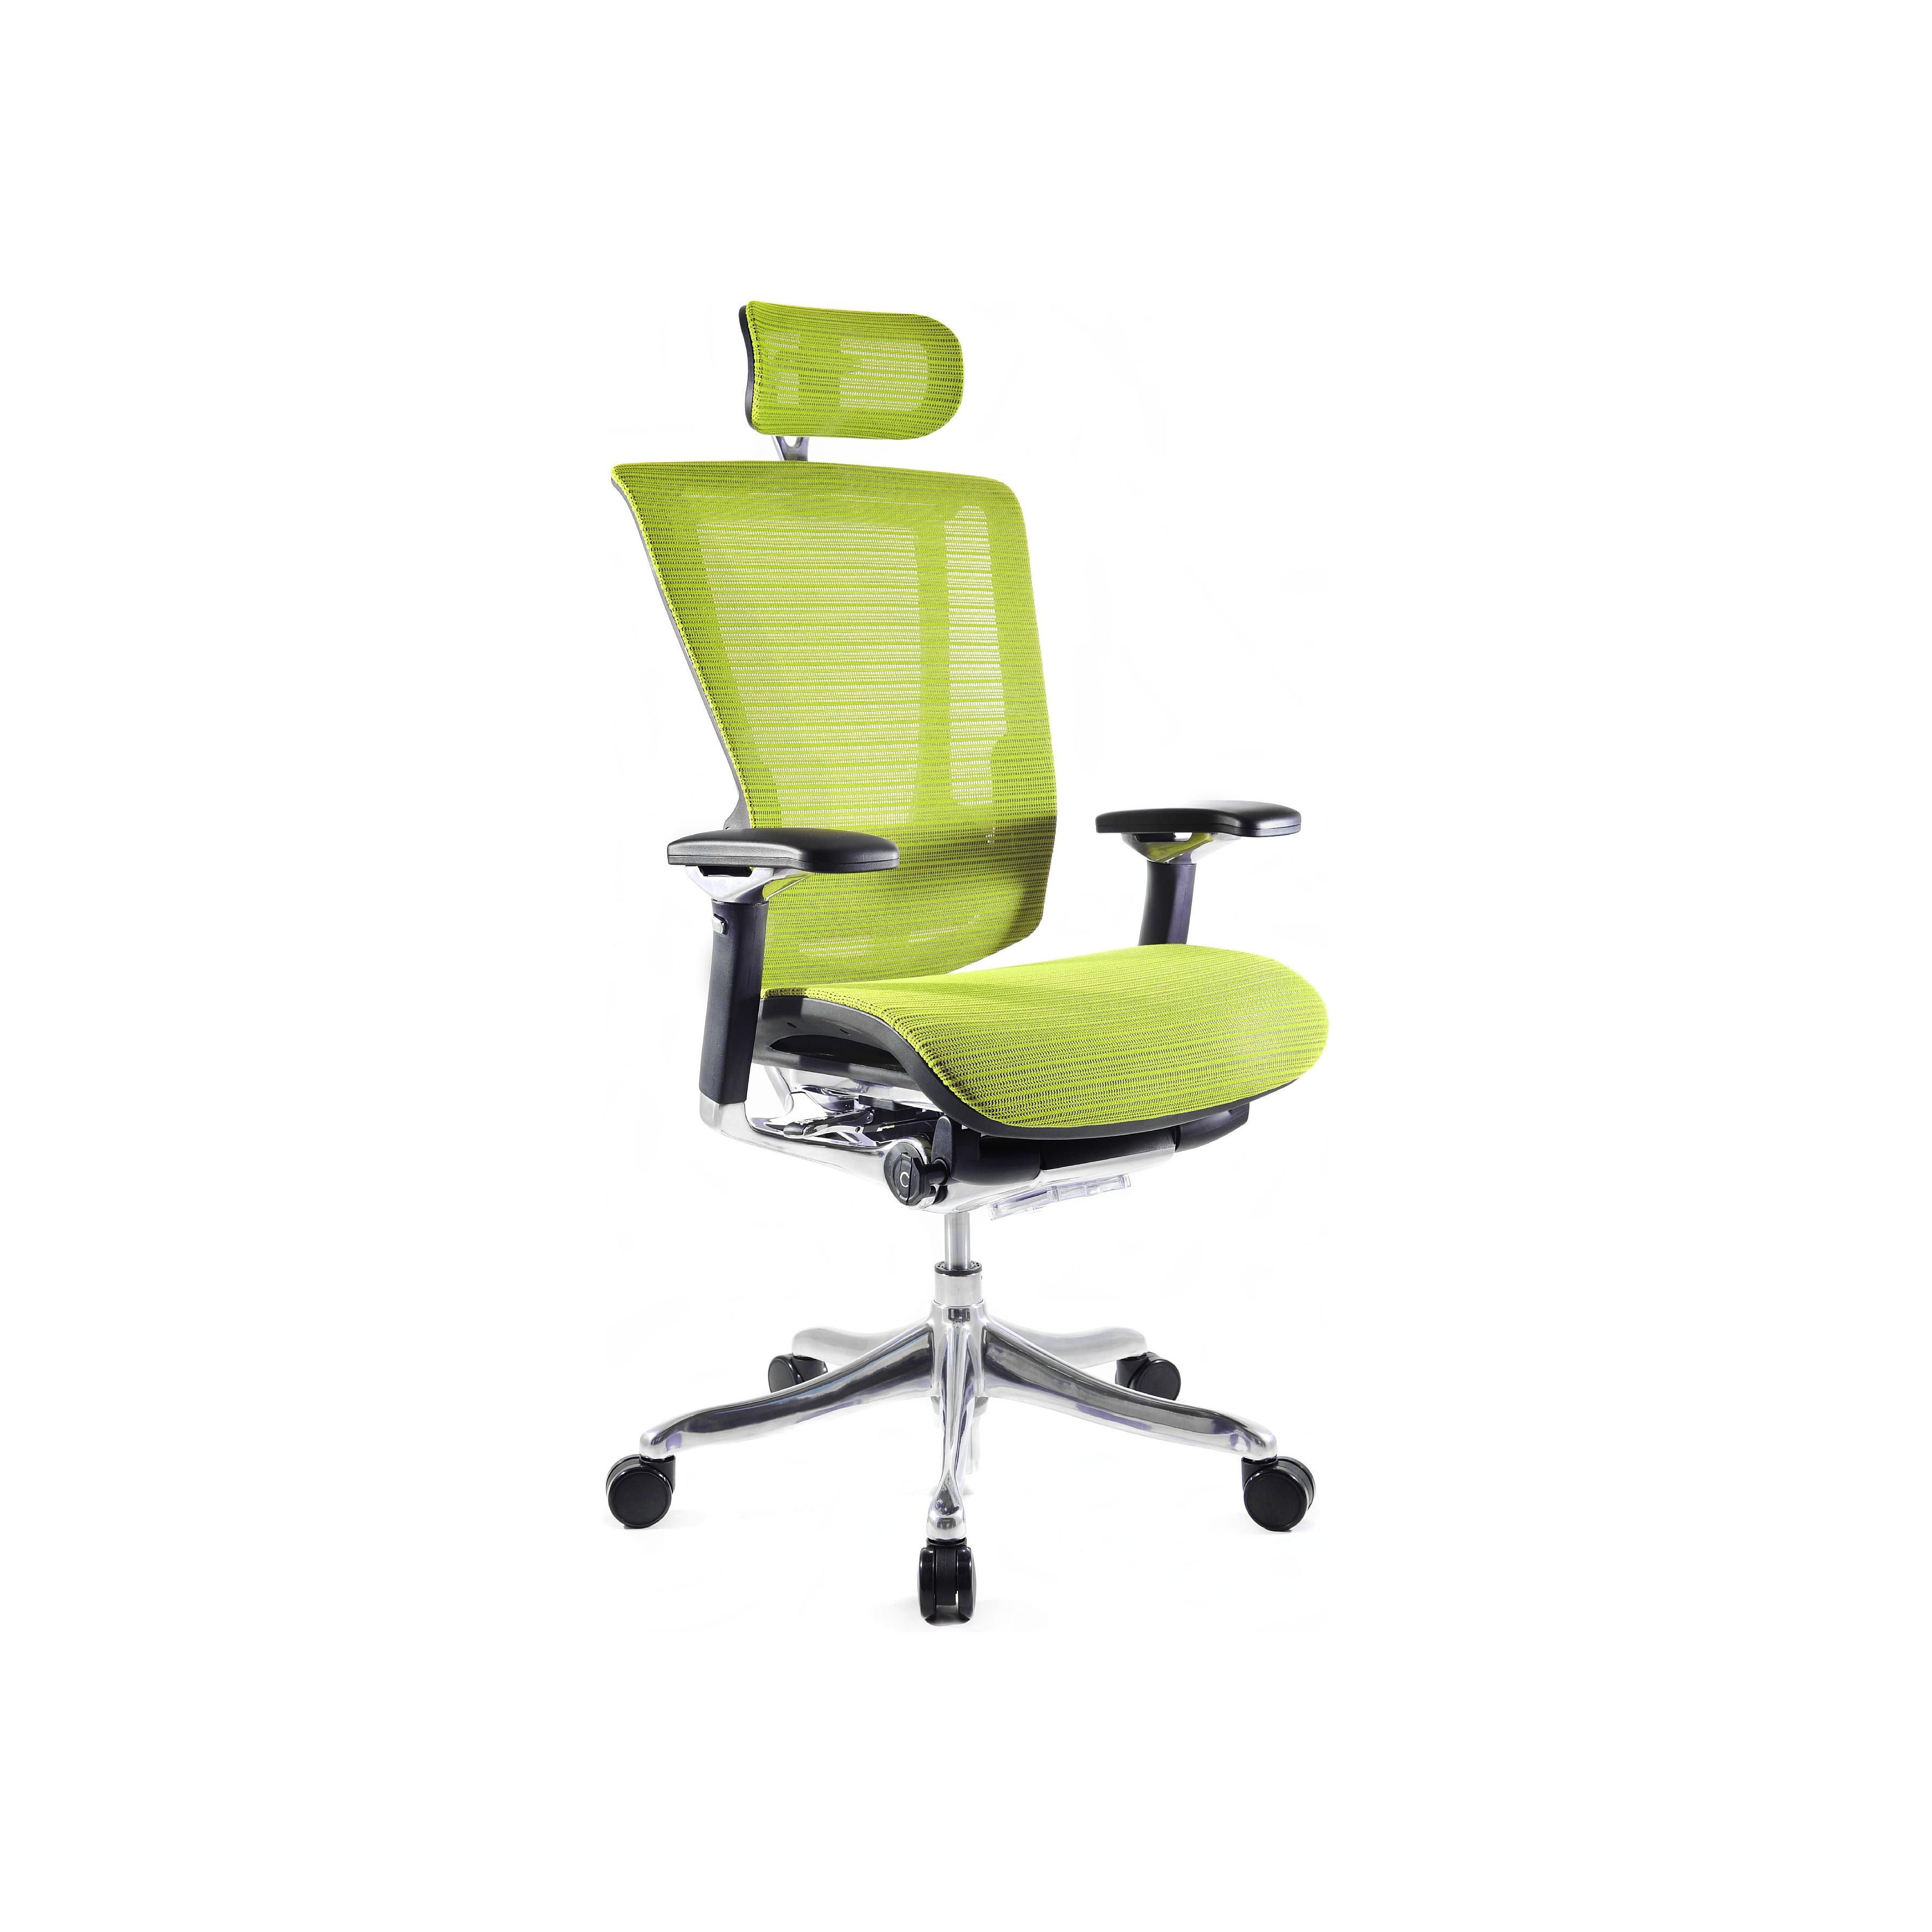 Nefil Ergonomic Mesh Office Chair With, Ergonomic Office Chair Uk